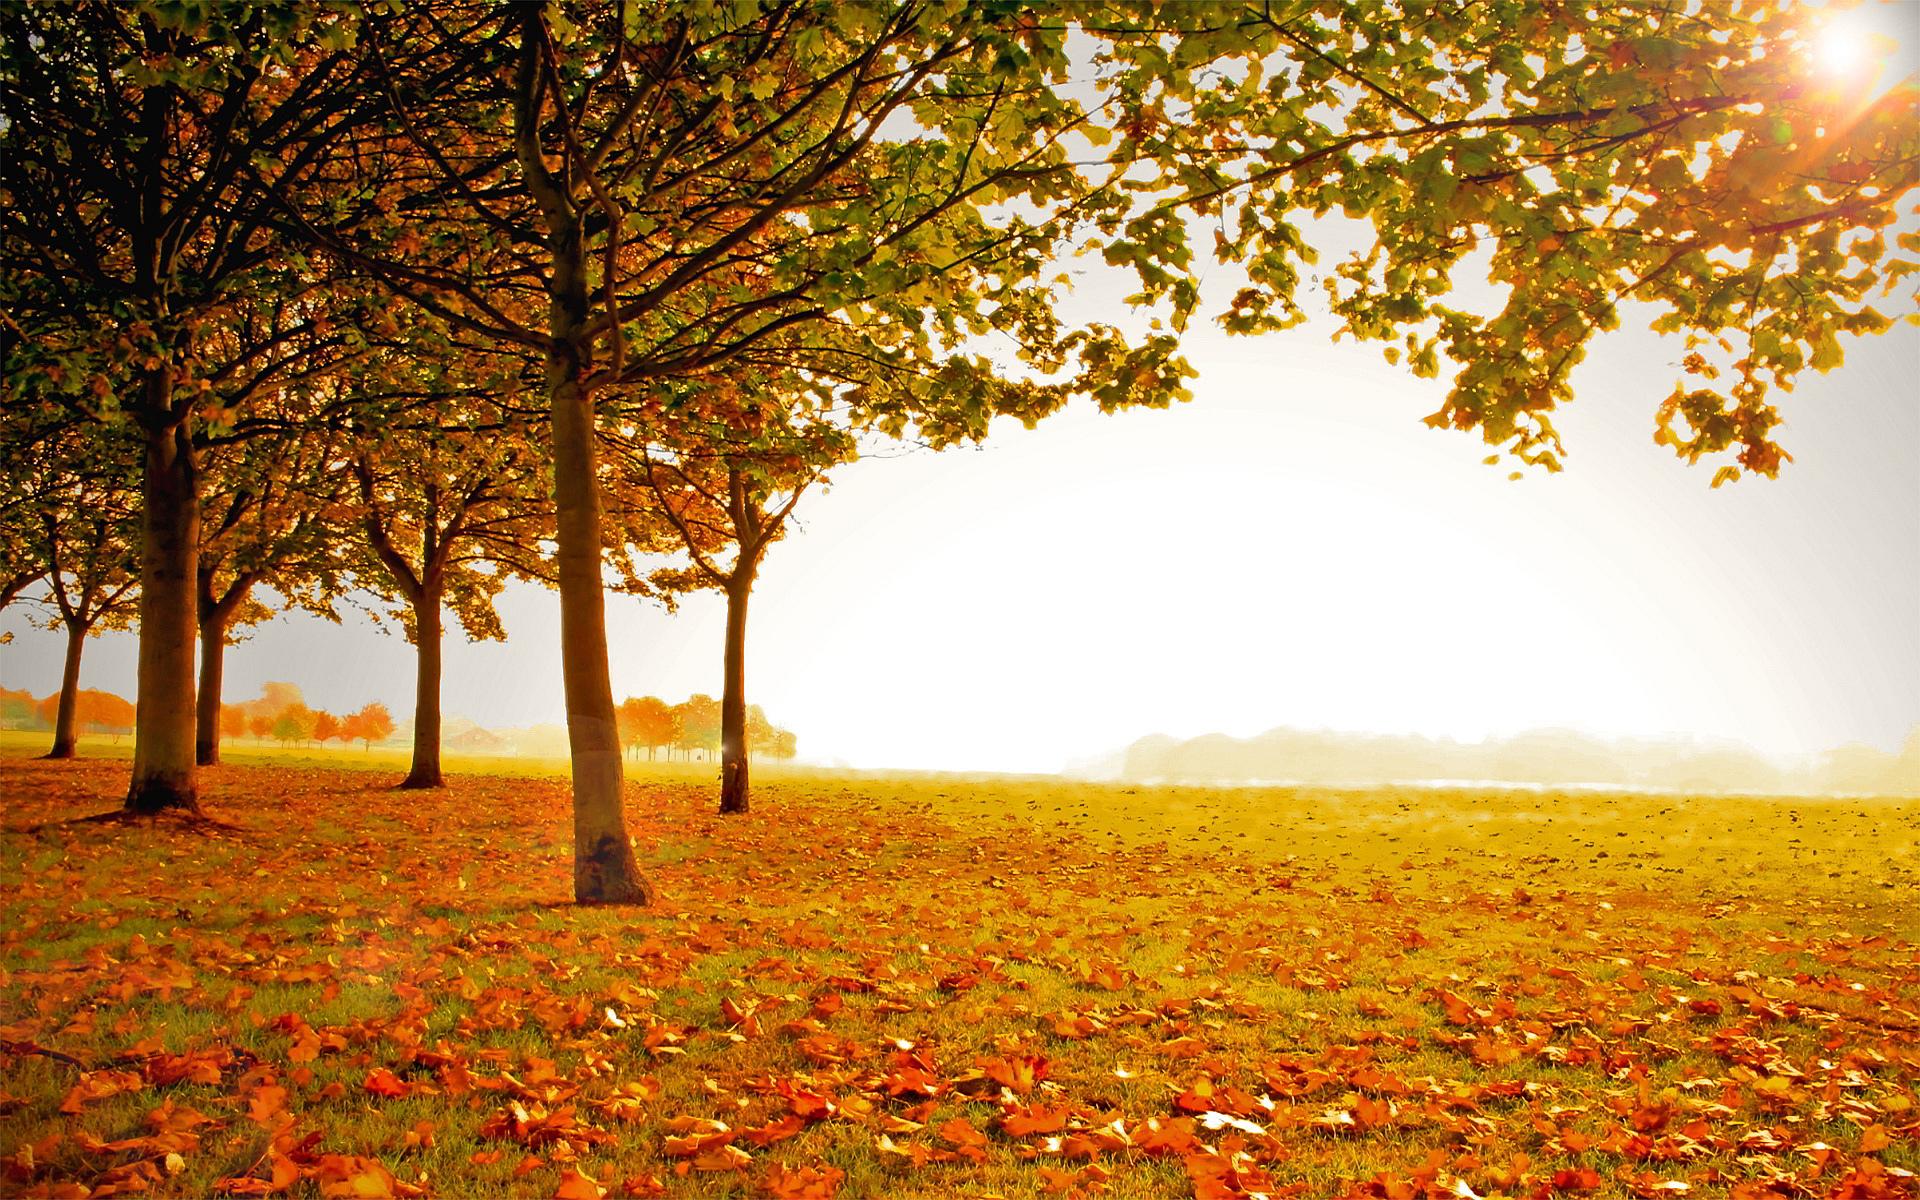 HD Autumn Landscape Wallpaper 5 - HD Wallpapers - Desktop ...